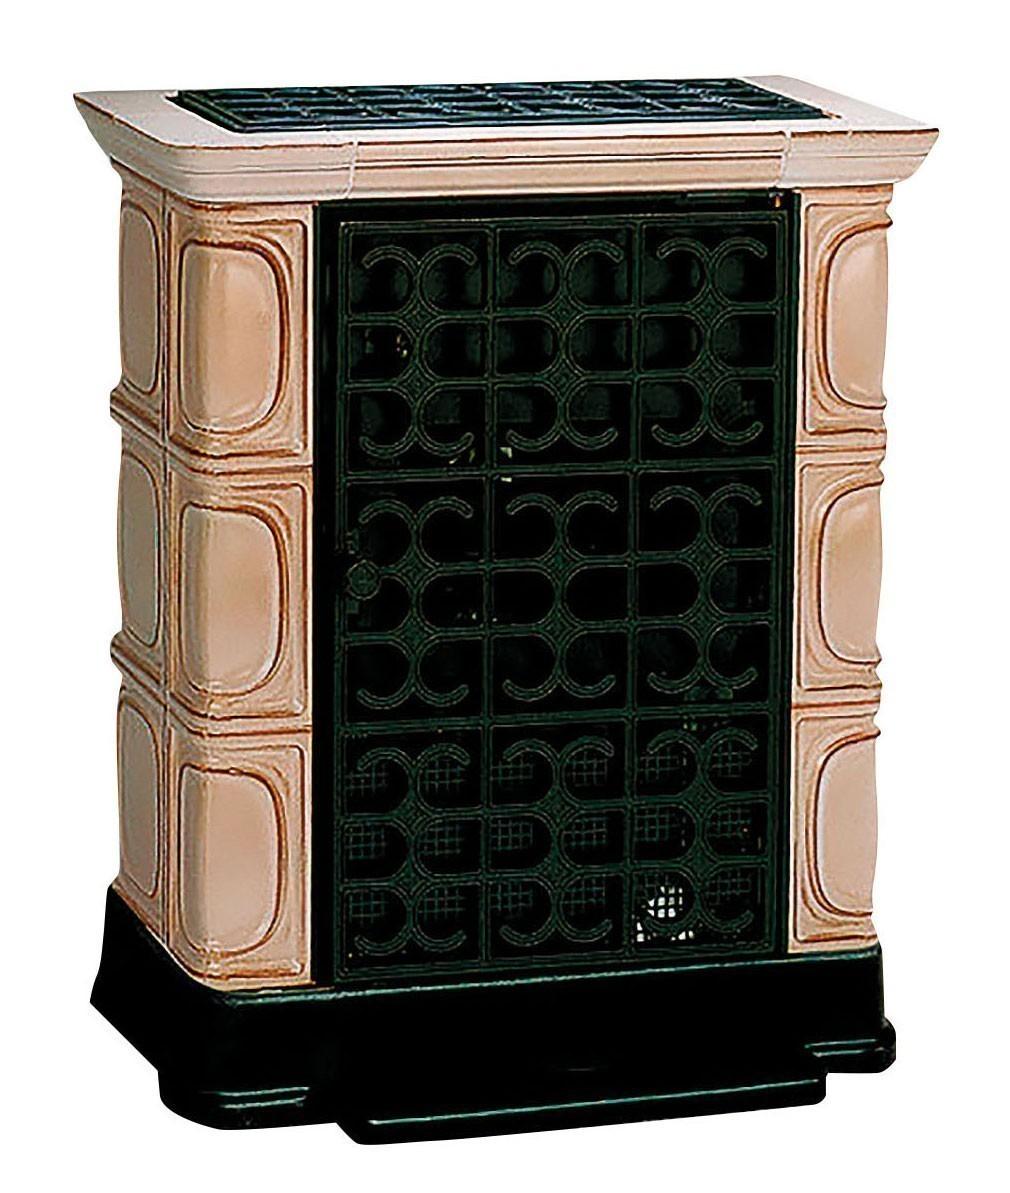 lofen haas sohn z rich iii keramik kork 6kw bei. Black Bedroom Furniture Sets. Home Design Ideas